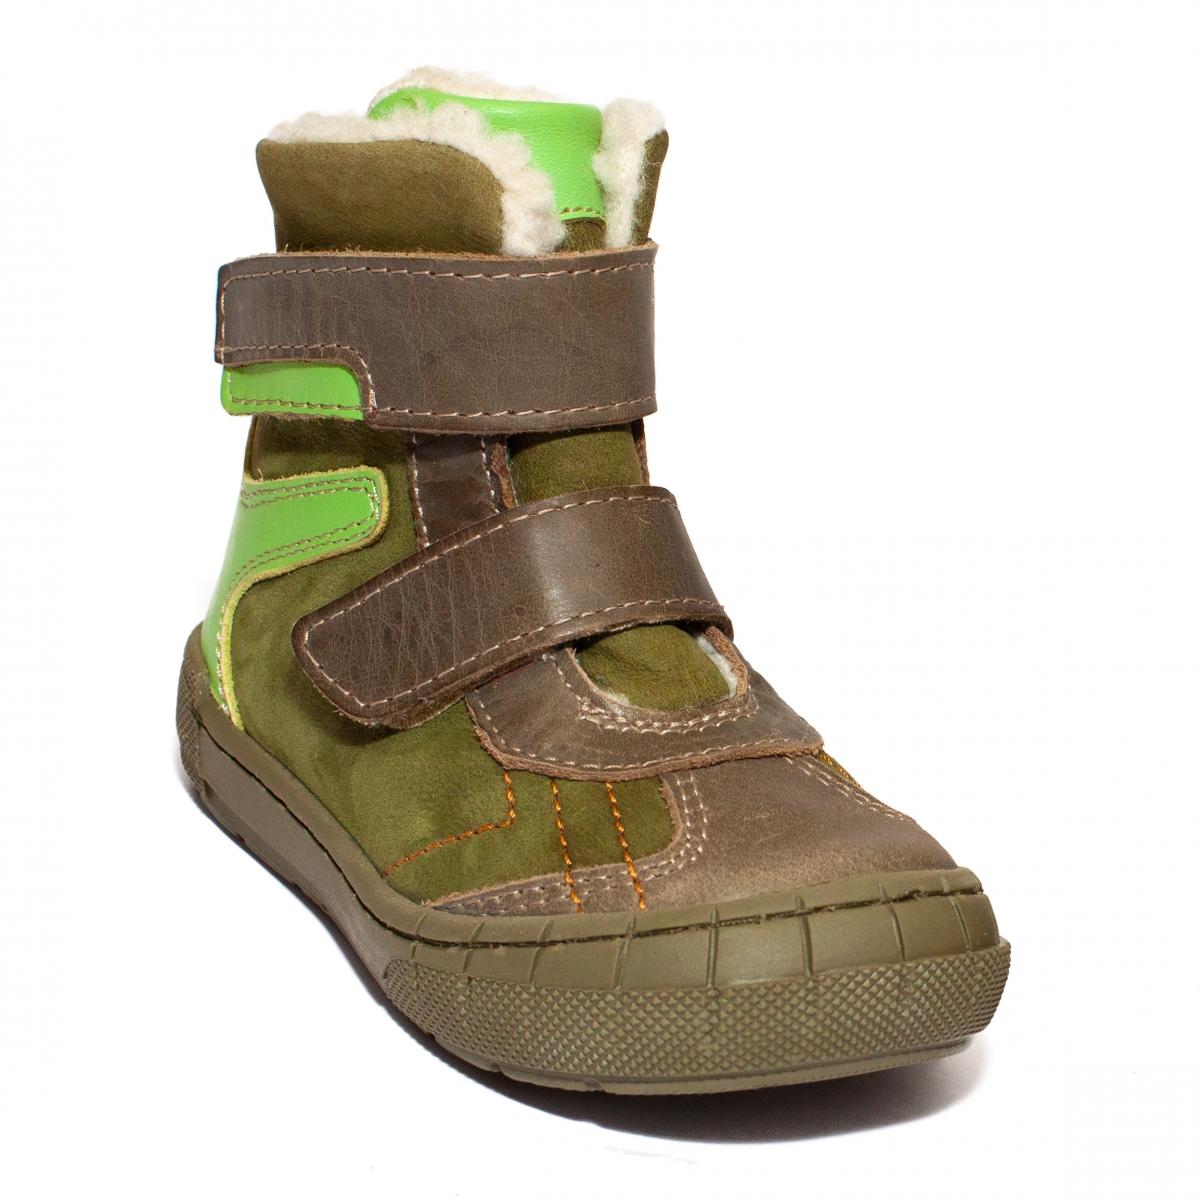 Ghetute copii cu blana pj shoes Kiro verde 20-29